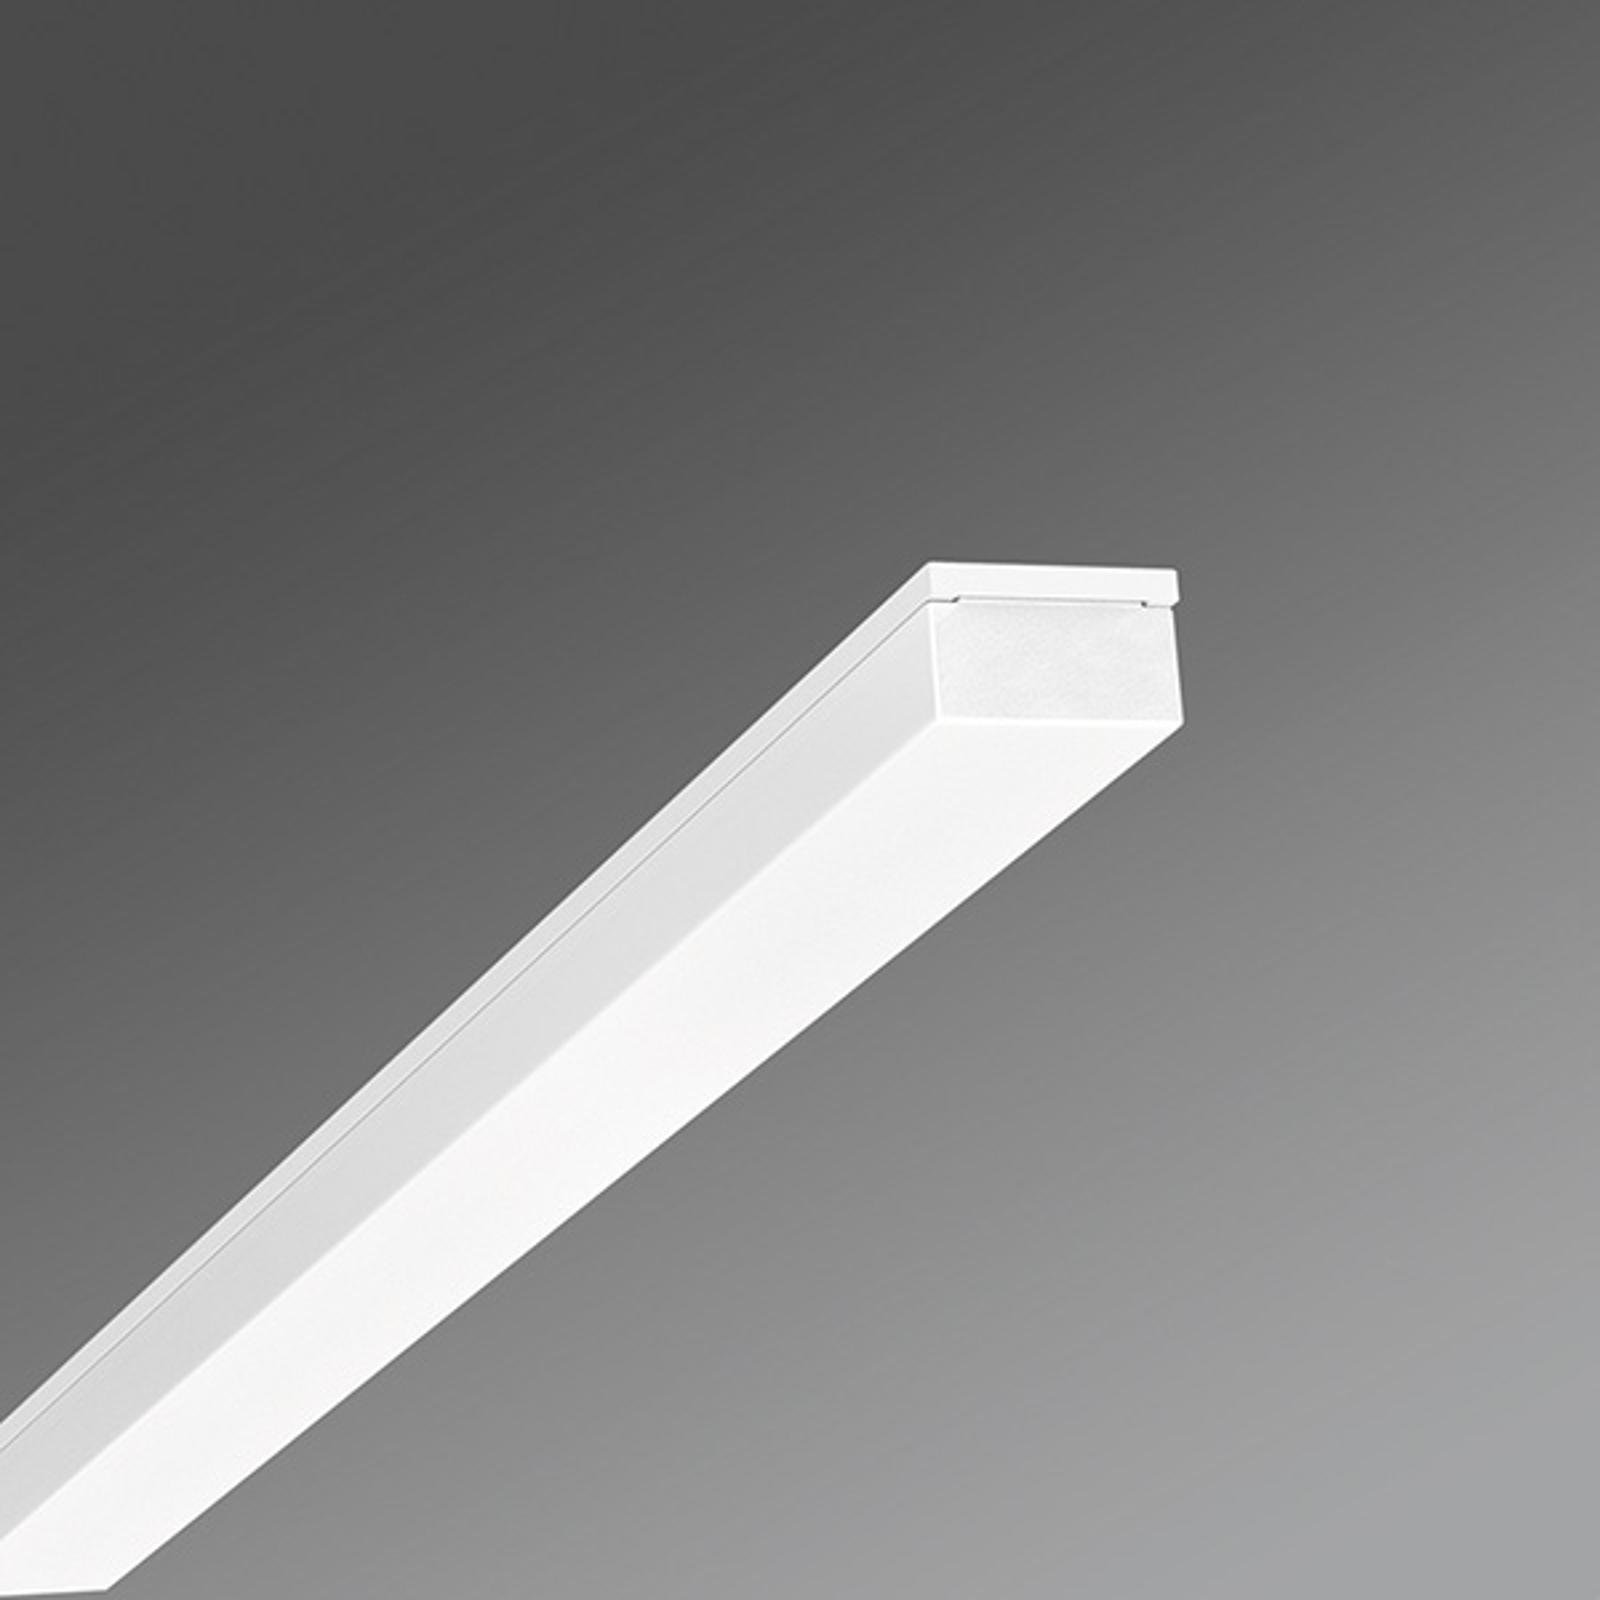 Diffuseur opale - plafonnier LED Wotek-WKO/1200 bc